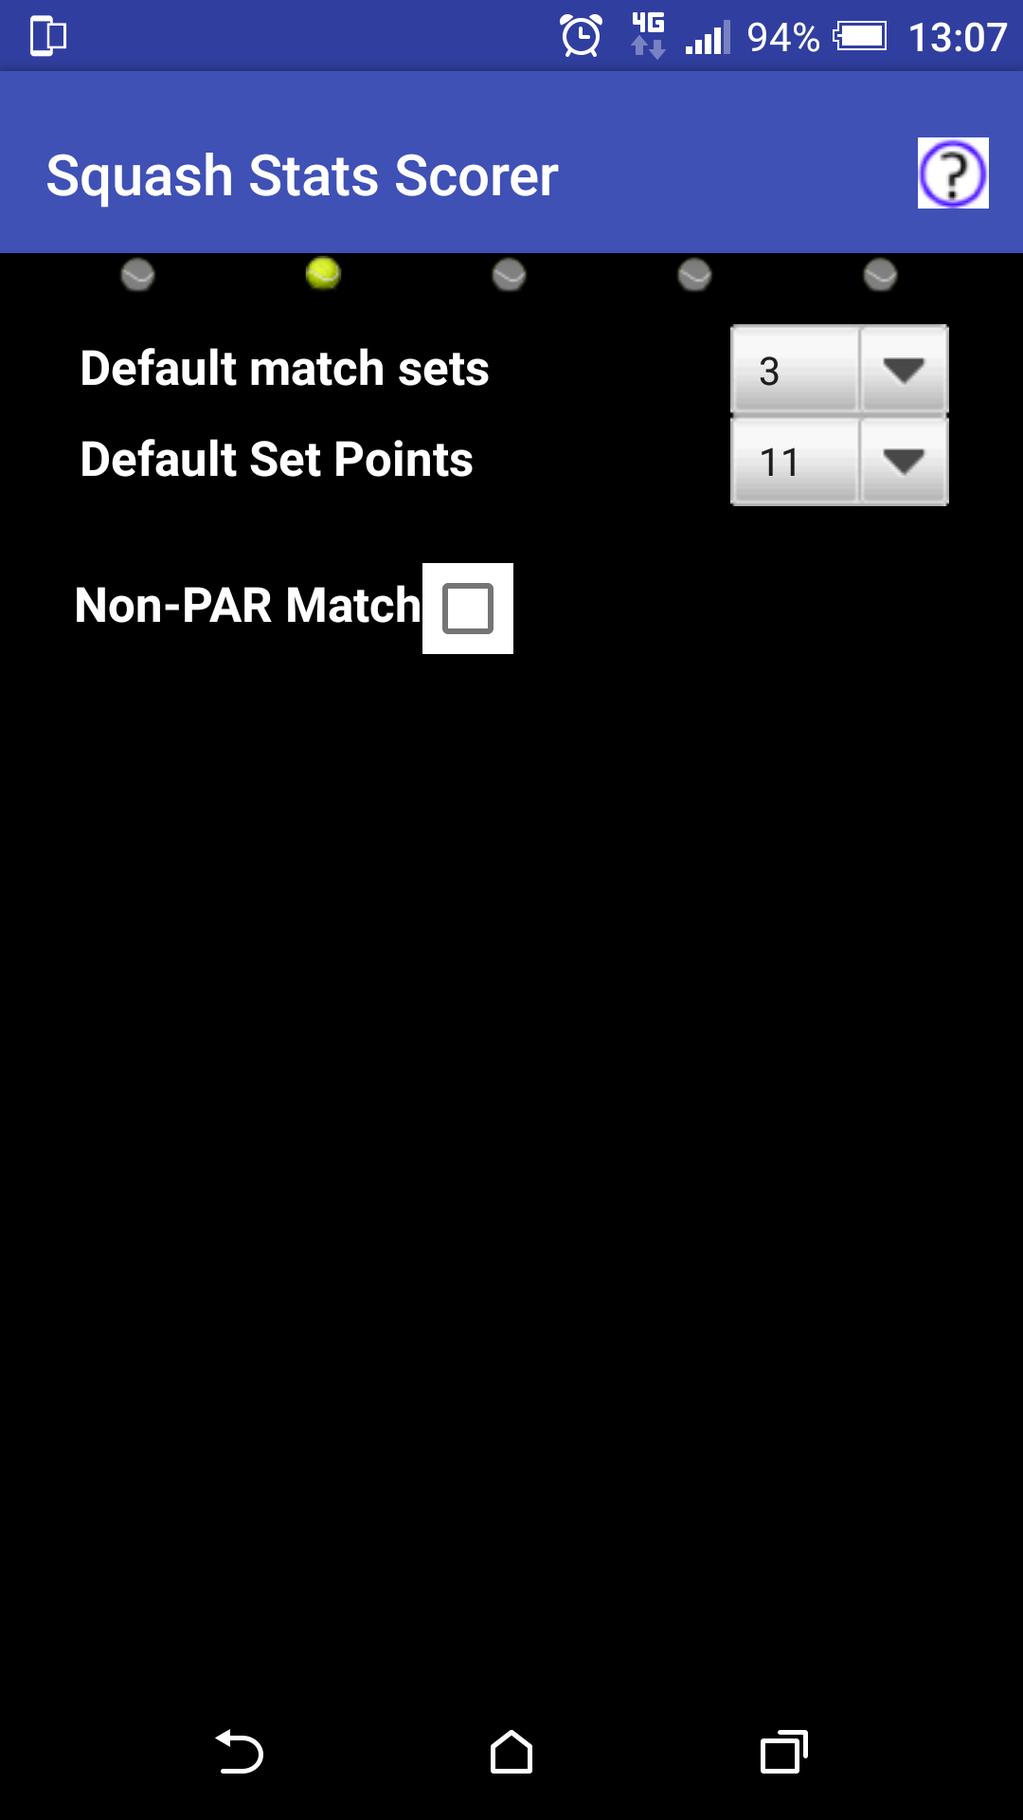 Squash Stats Scorer Screenshot 2